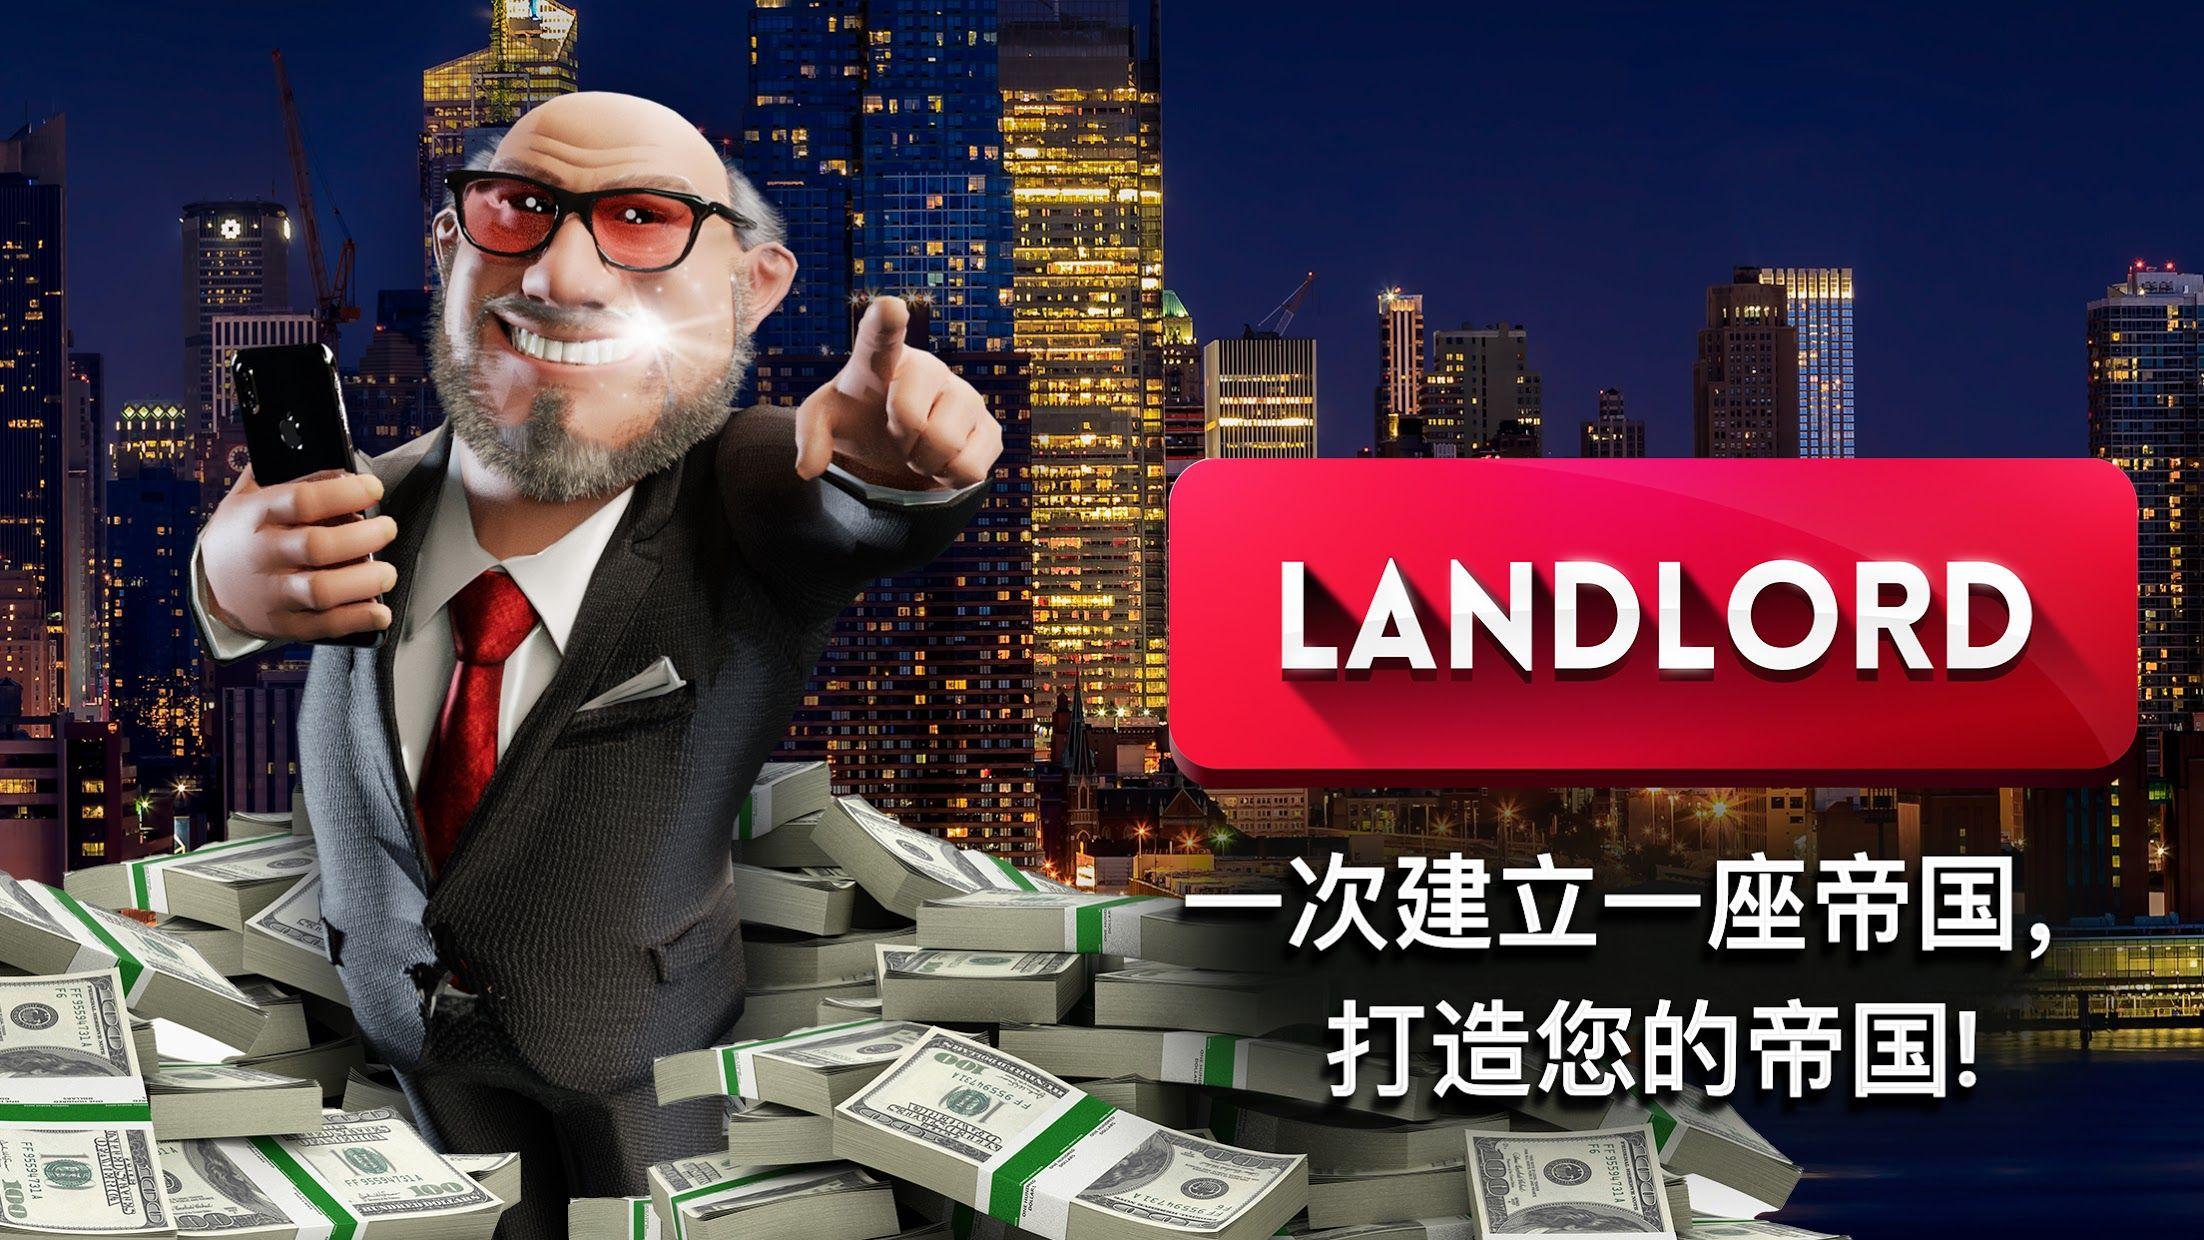 Landlord Tycoon - 探索真实世界城市房地产投资交易模拟经营游戏成为地产富豪 游戏截图5